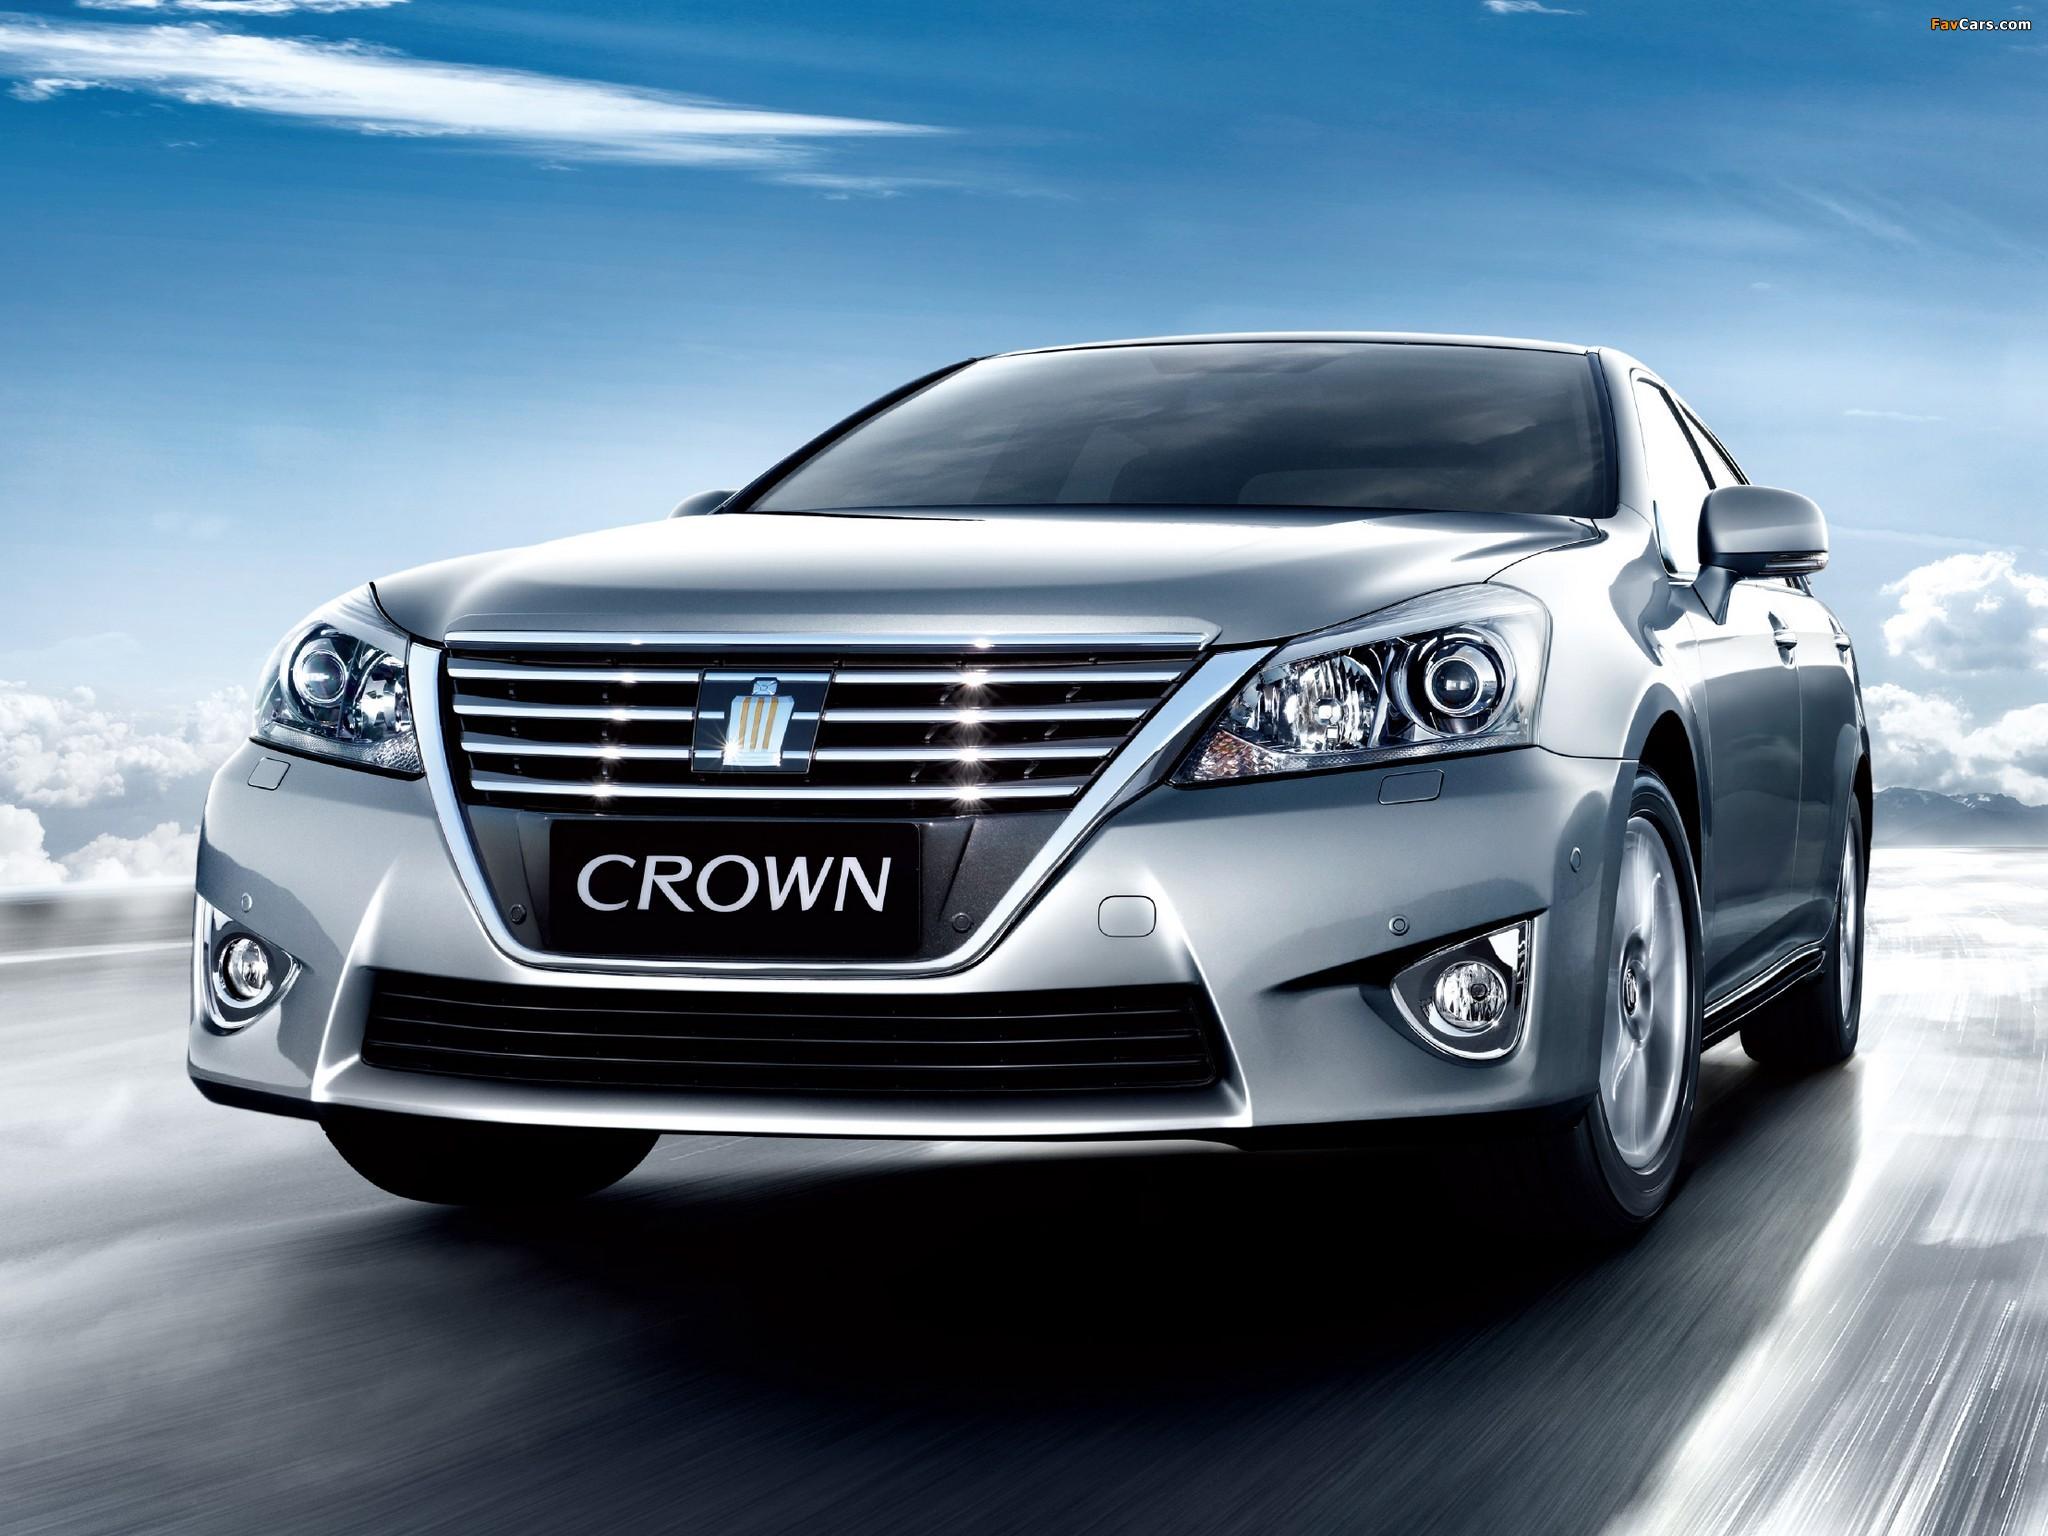 Toyota Crown Royal Saloon V8 - toyota-forum.de